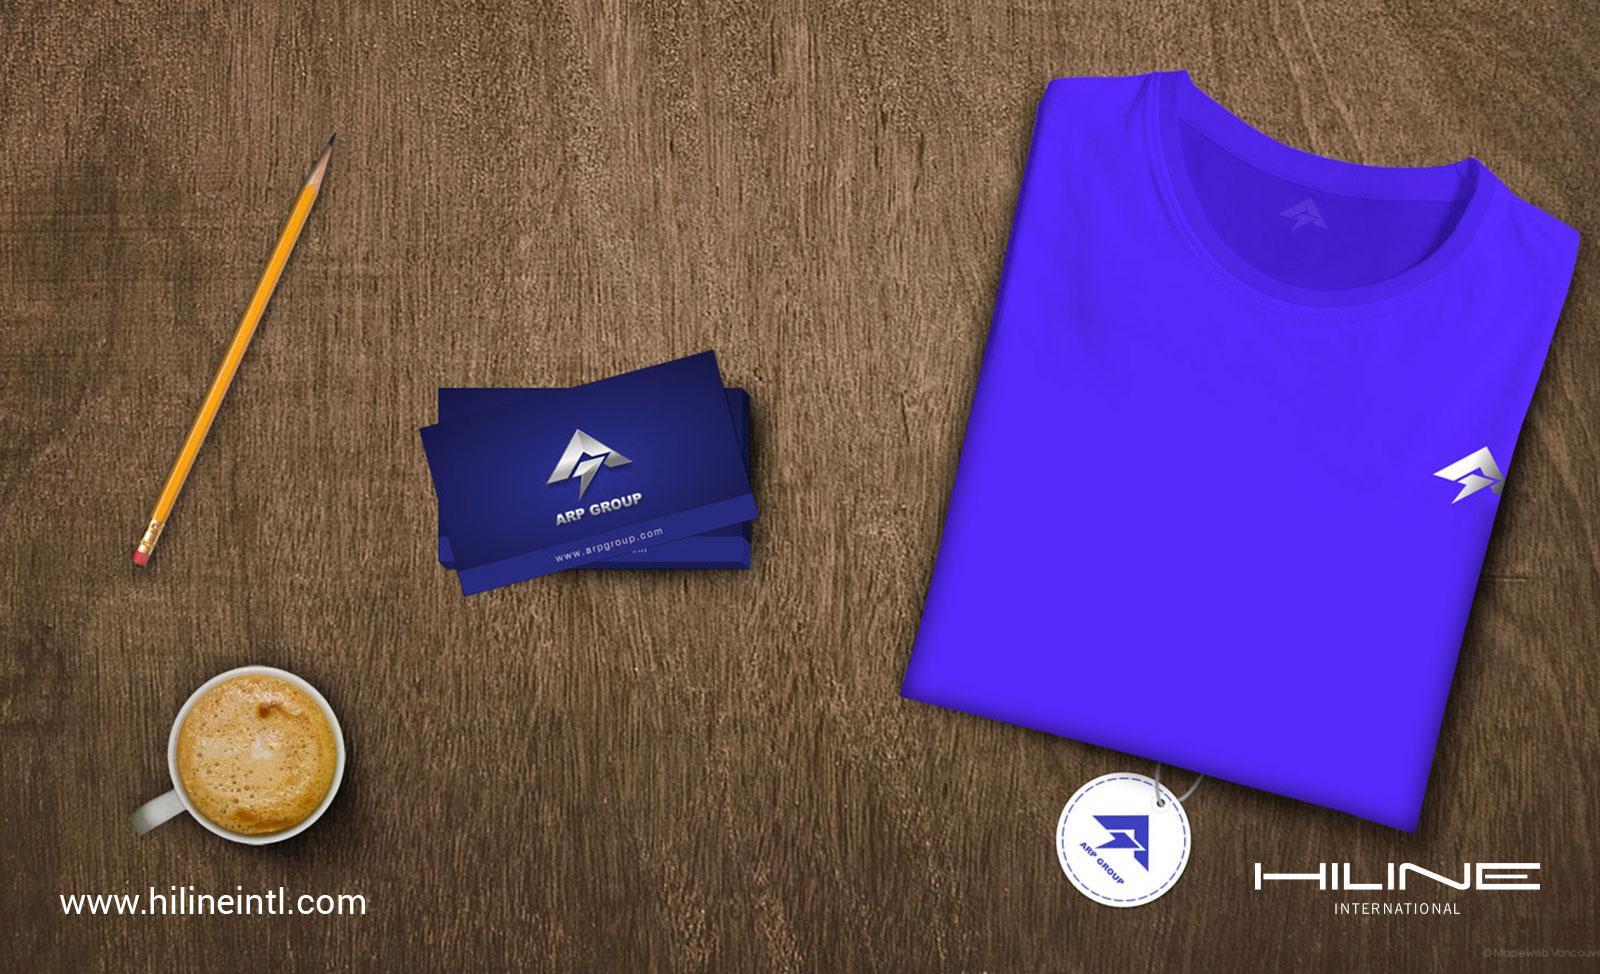 graphic-brand-design-web-designer-hiline-lahore-pakistan-arp-group-006